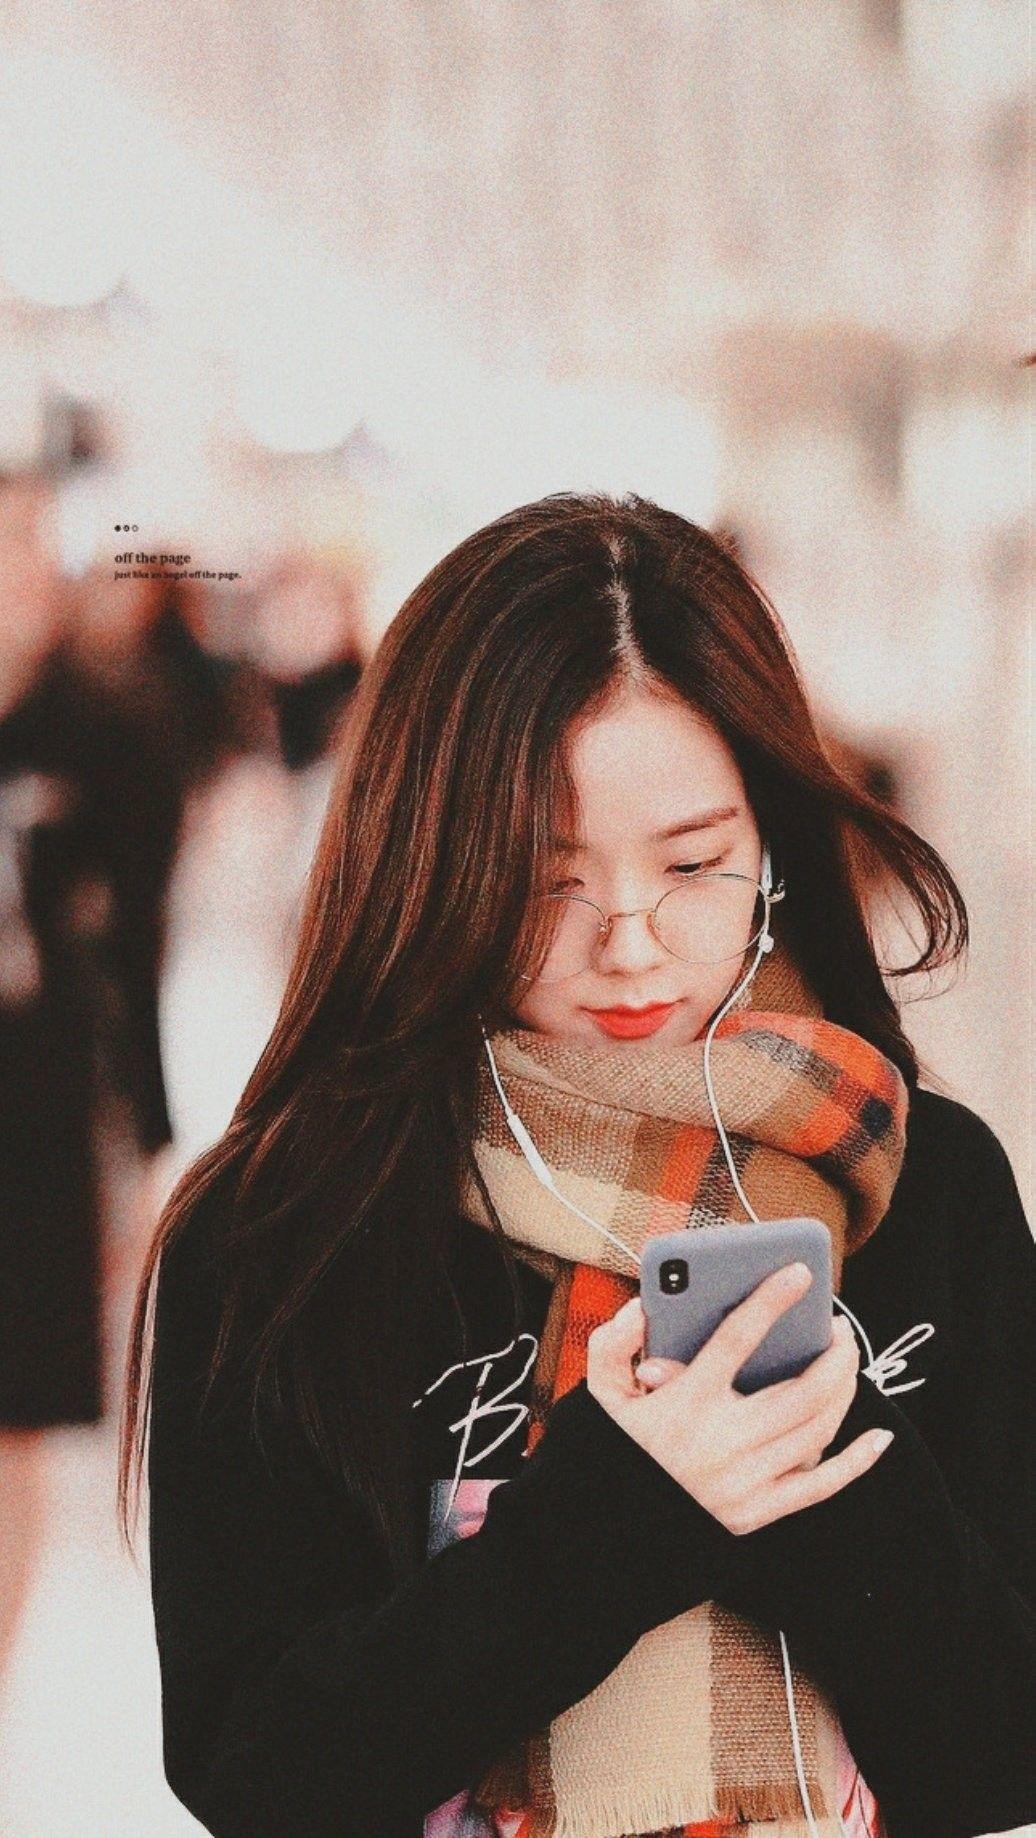 Blackpink Wallpaper Kim Jisoo Fotografi Remaja Selebriti Selebritas